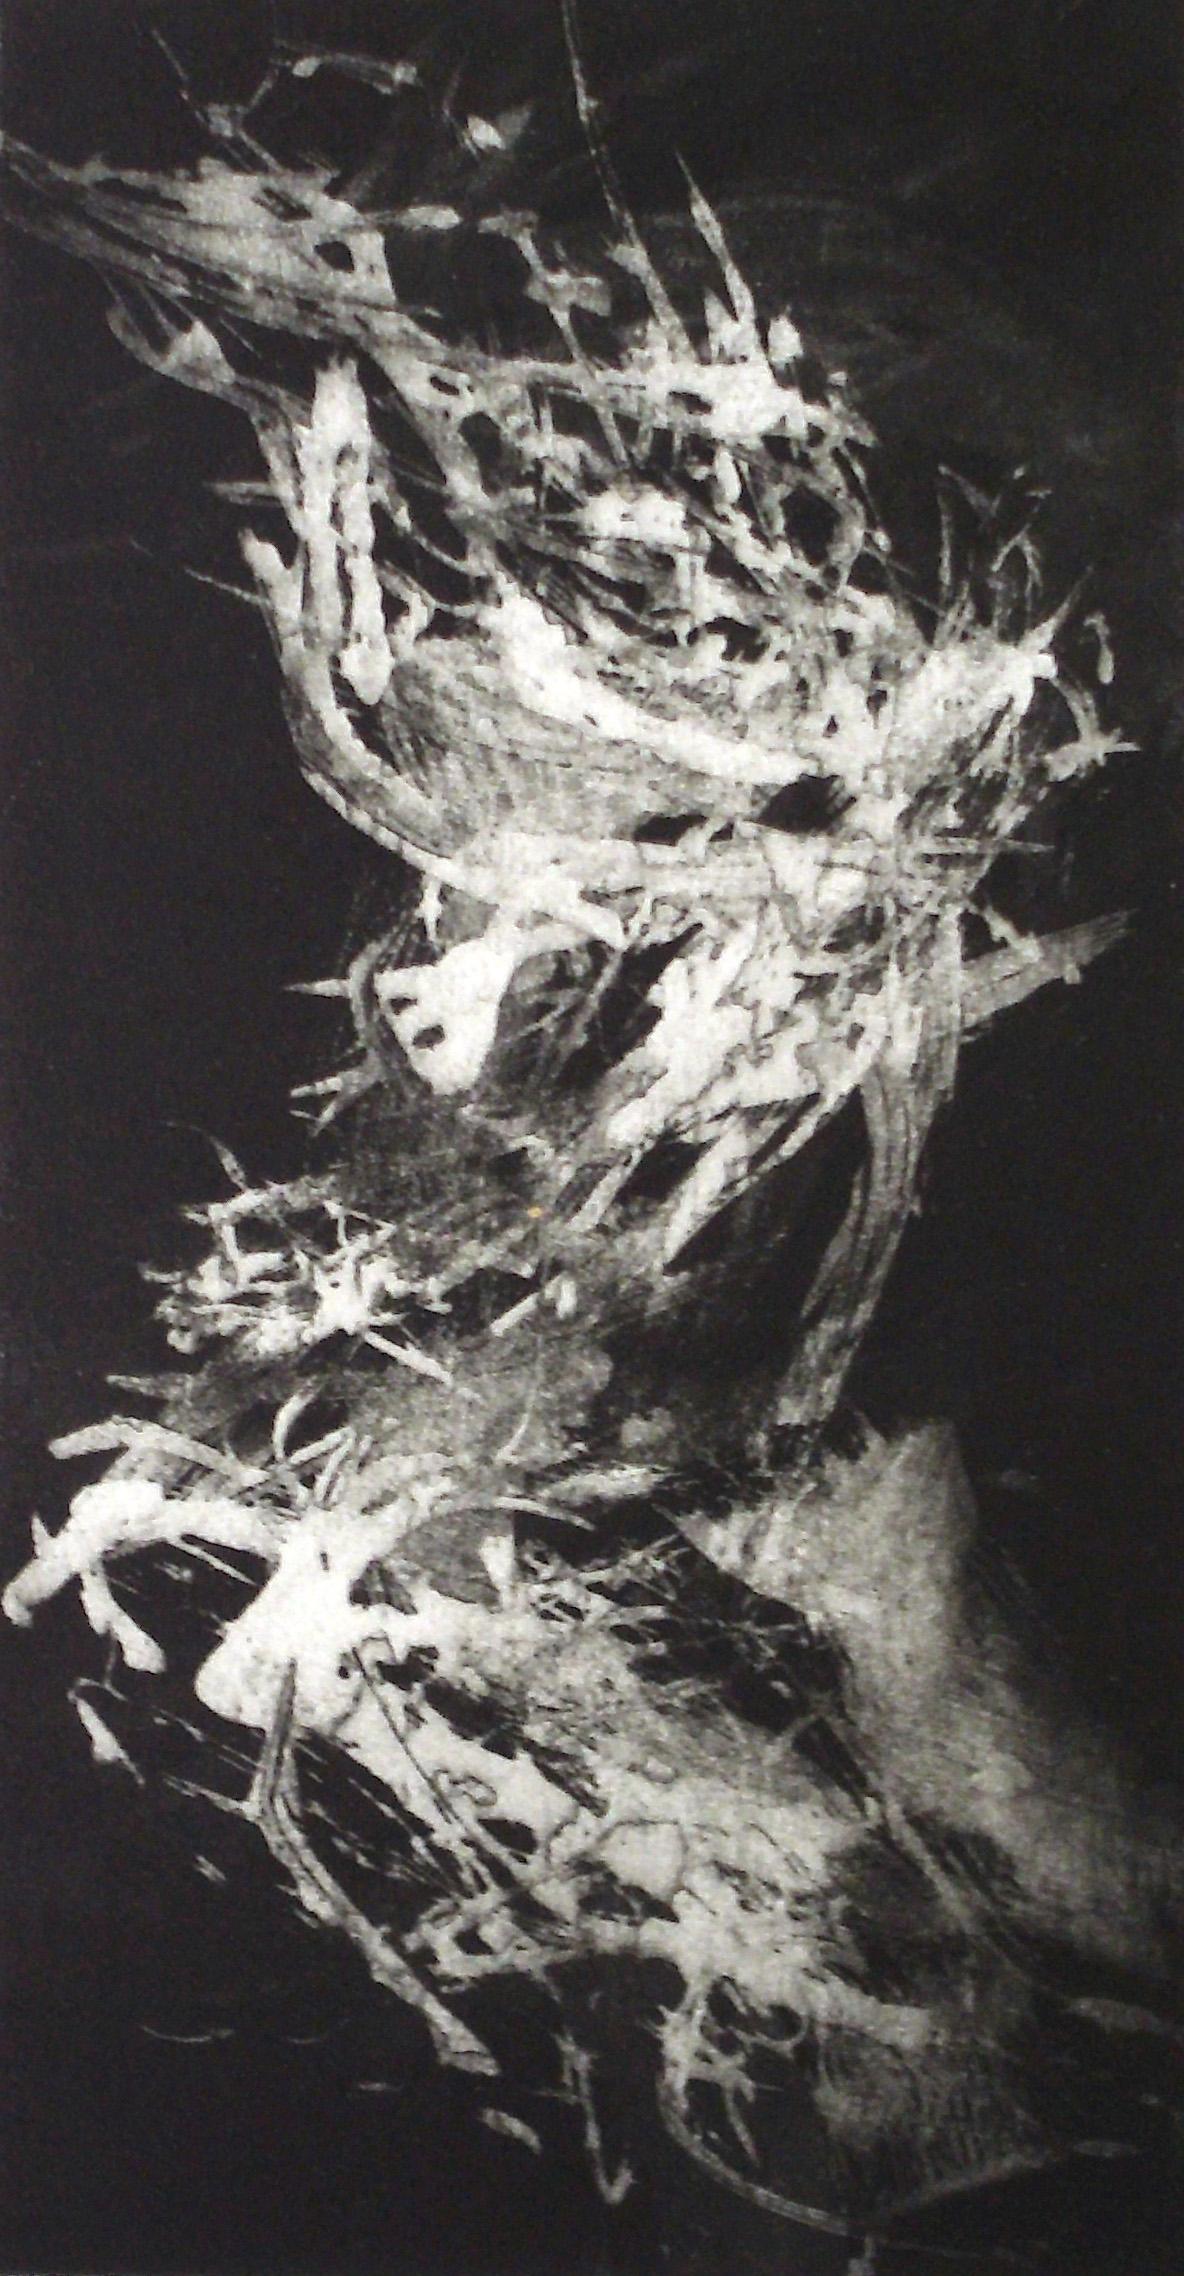 01-kerstin_franke-gneuss-aphrodite-2013-aussprenge_aquatintaradierung-33.9x17.8